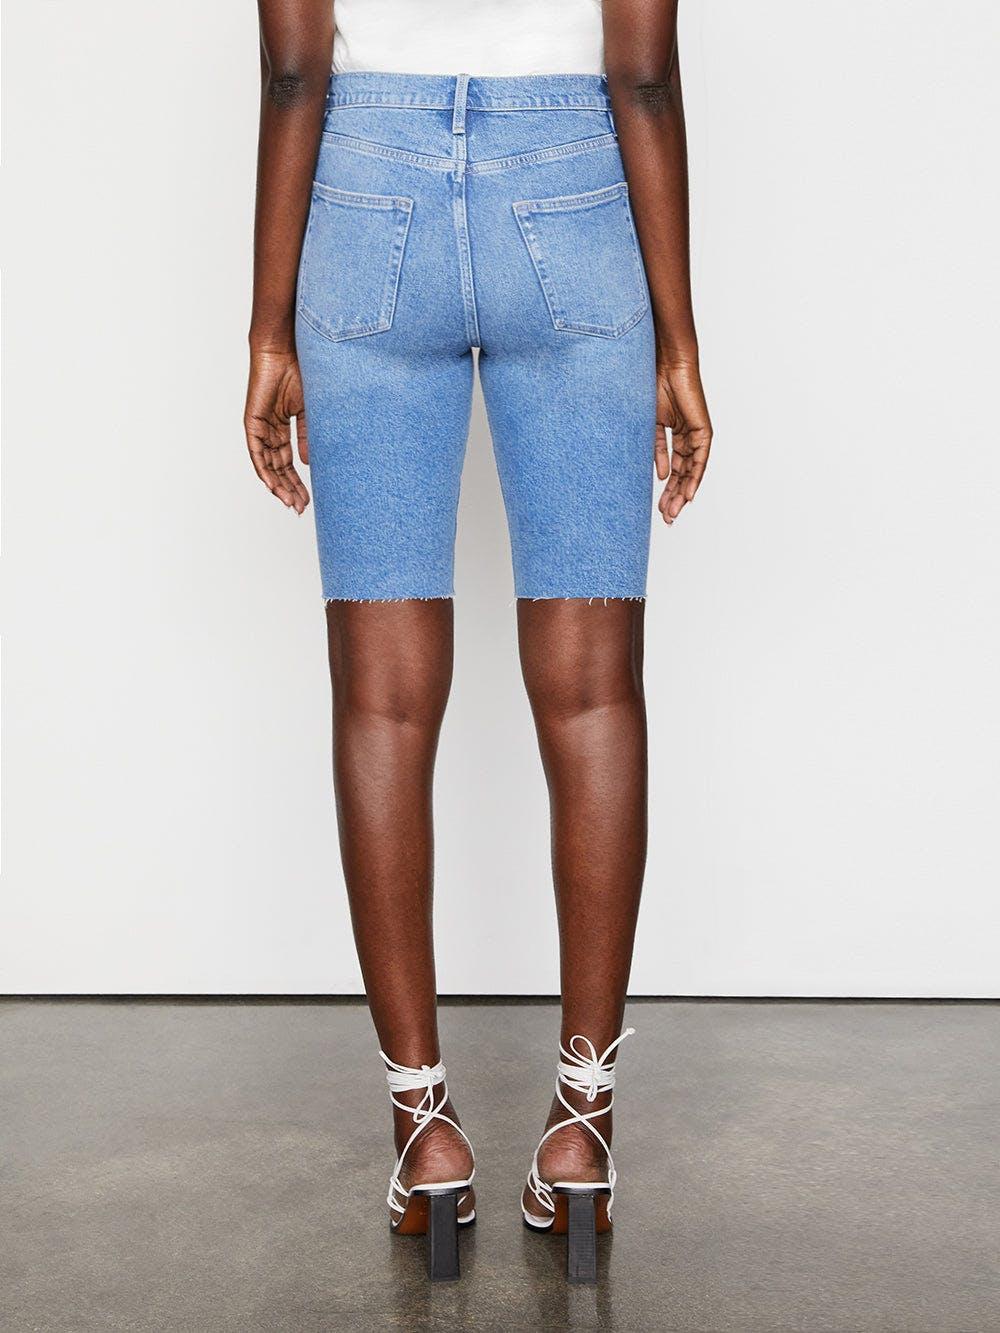 shorts back view